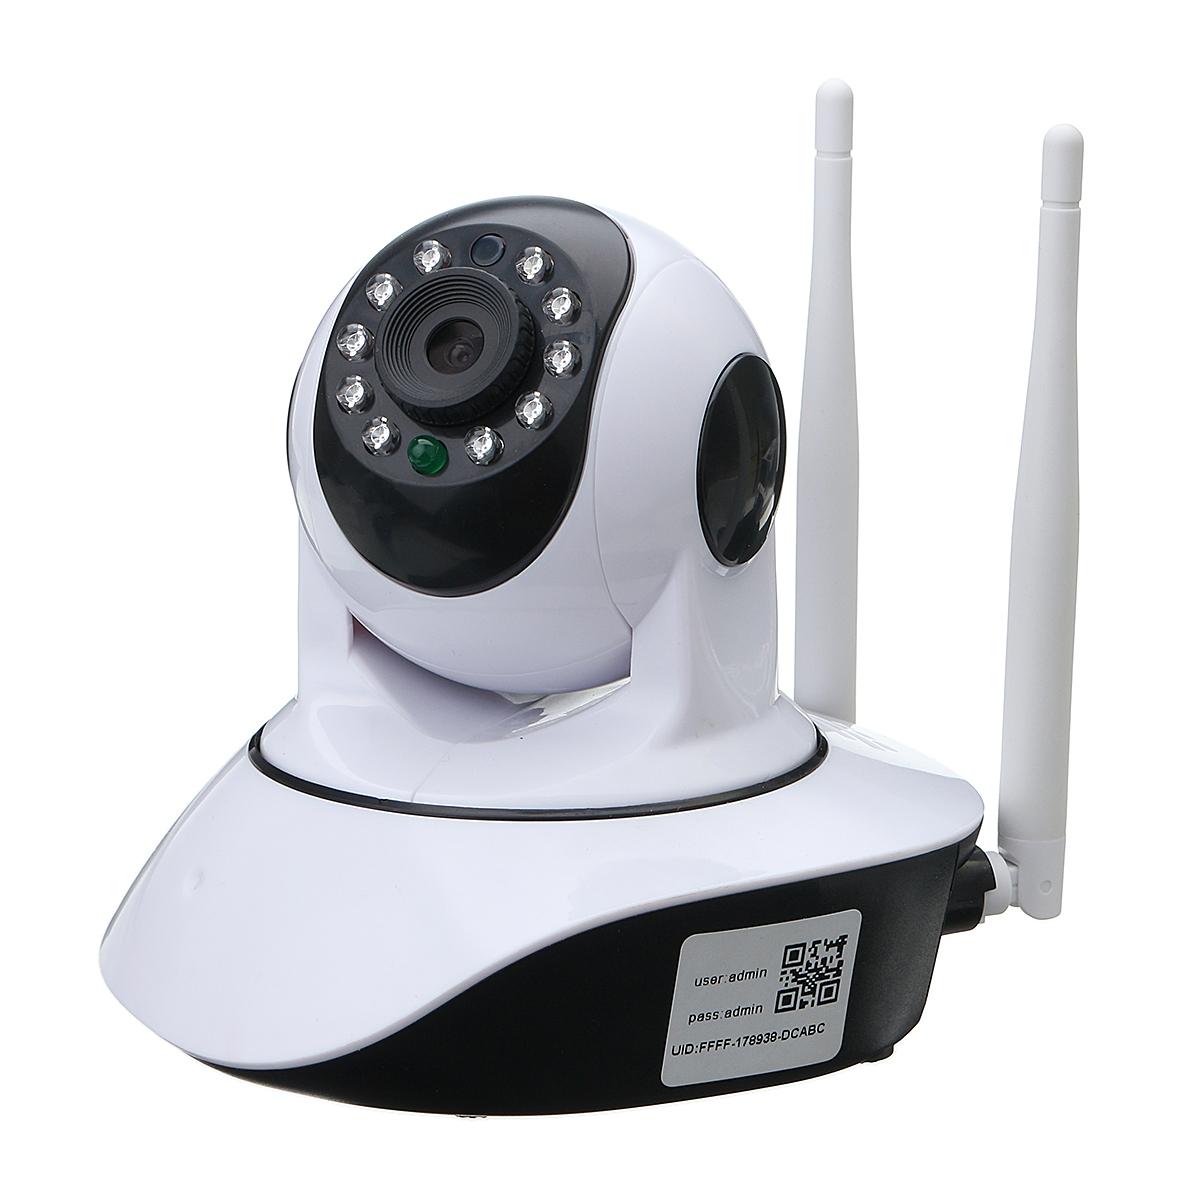 720P Wireless IP Camera Security Network CCTV Camera Pan Tilt Night Vision WIFI Webcam